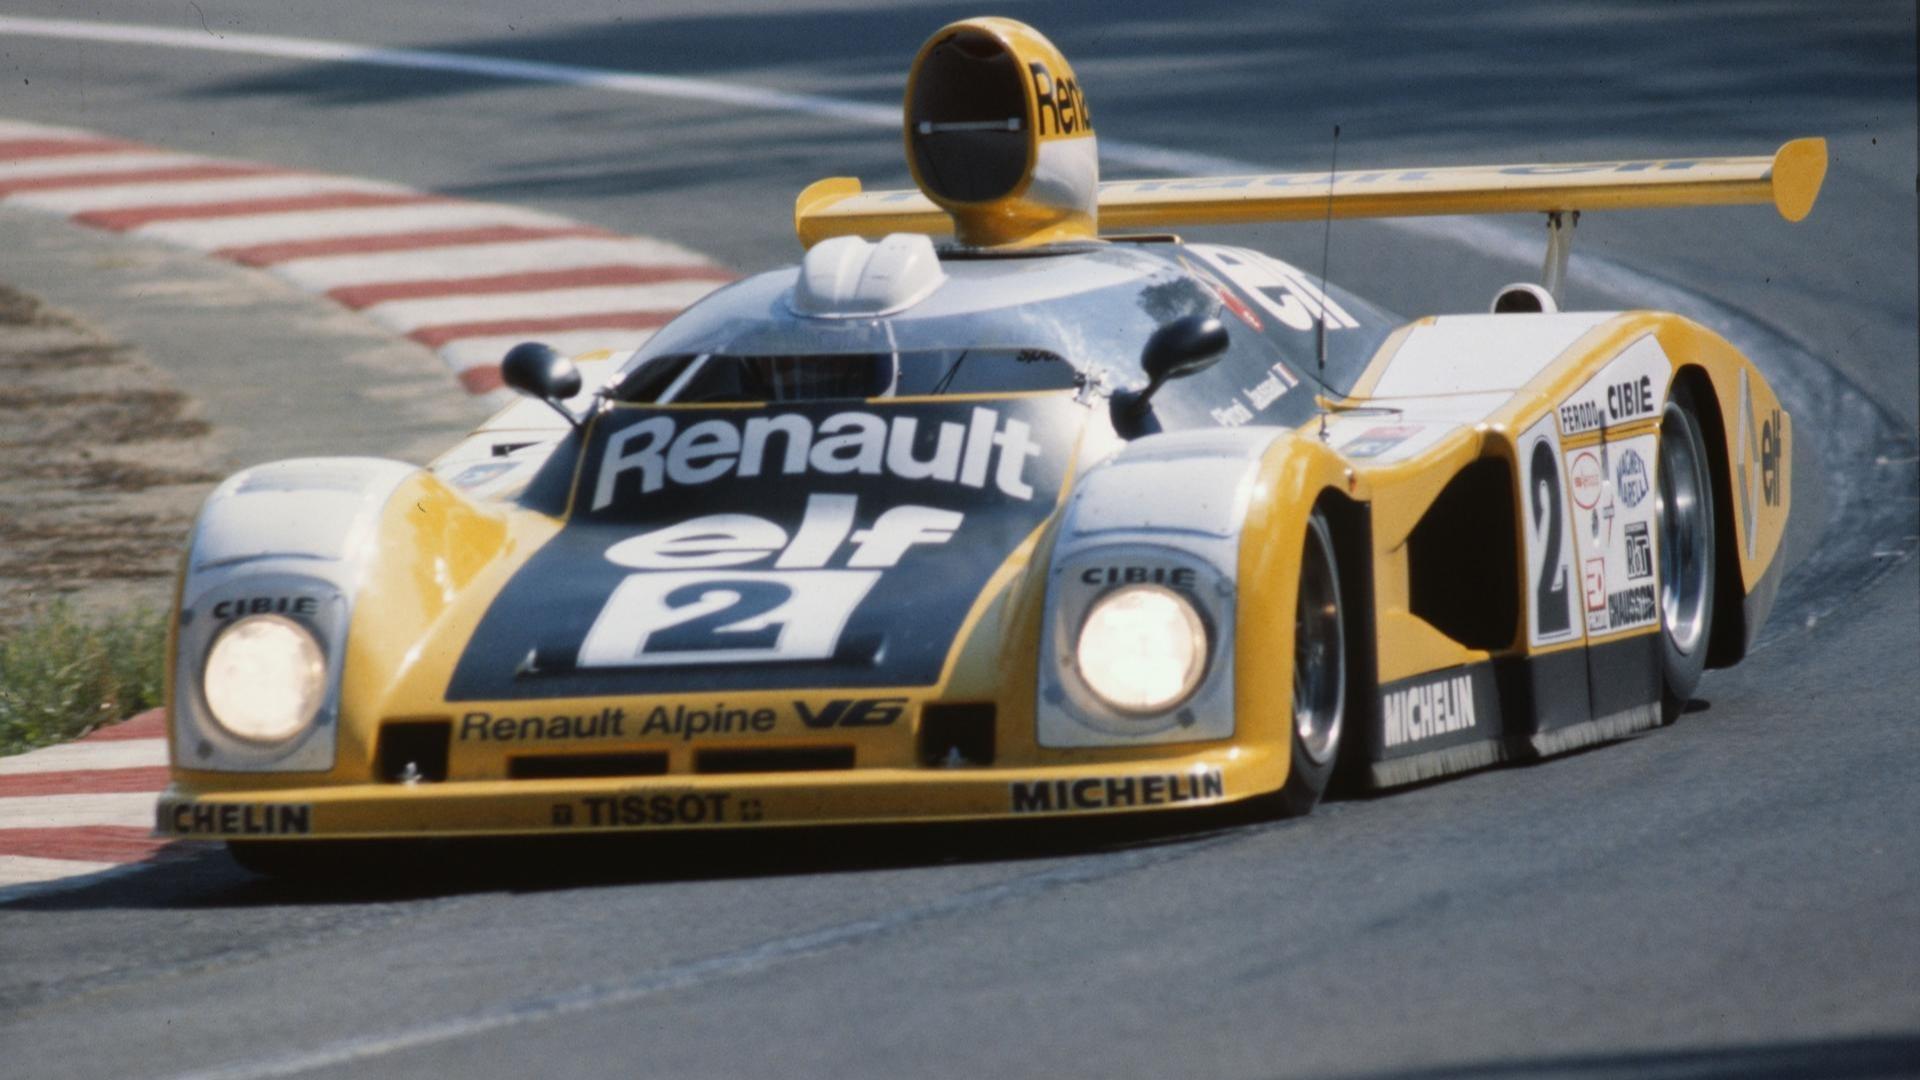 Renault-Alpine A442B på vei mot den ultimate triumfen: Seier på Le Mans!